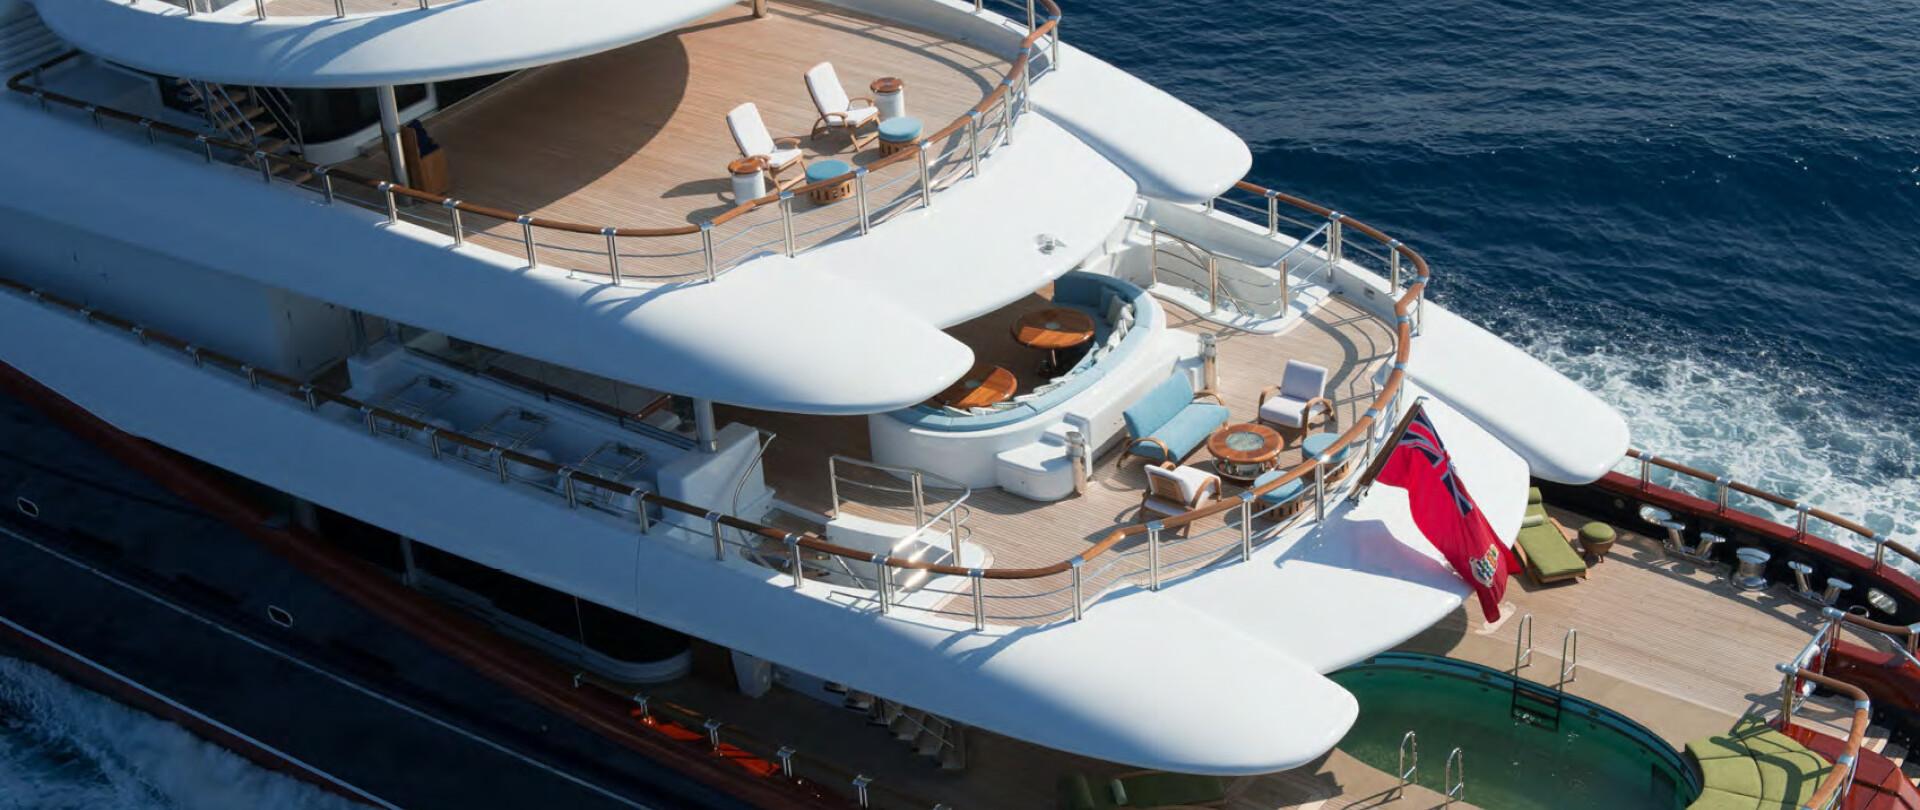 NIRVANA Yacht for Sale photo 5